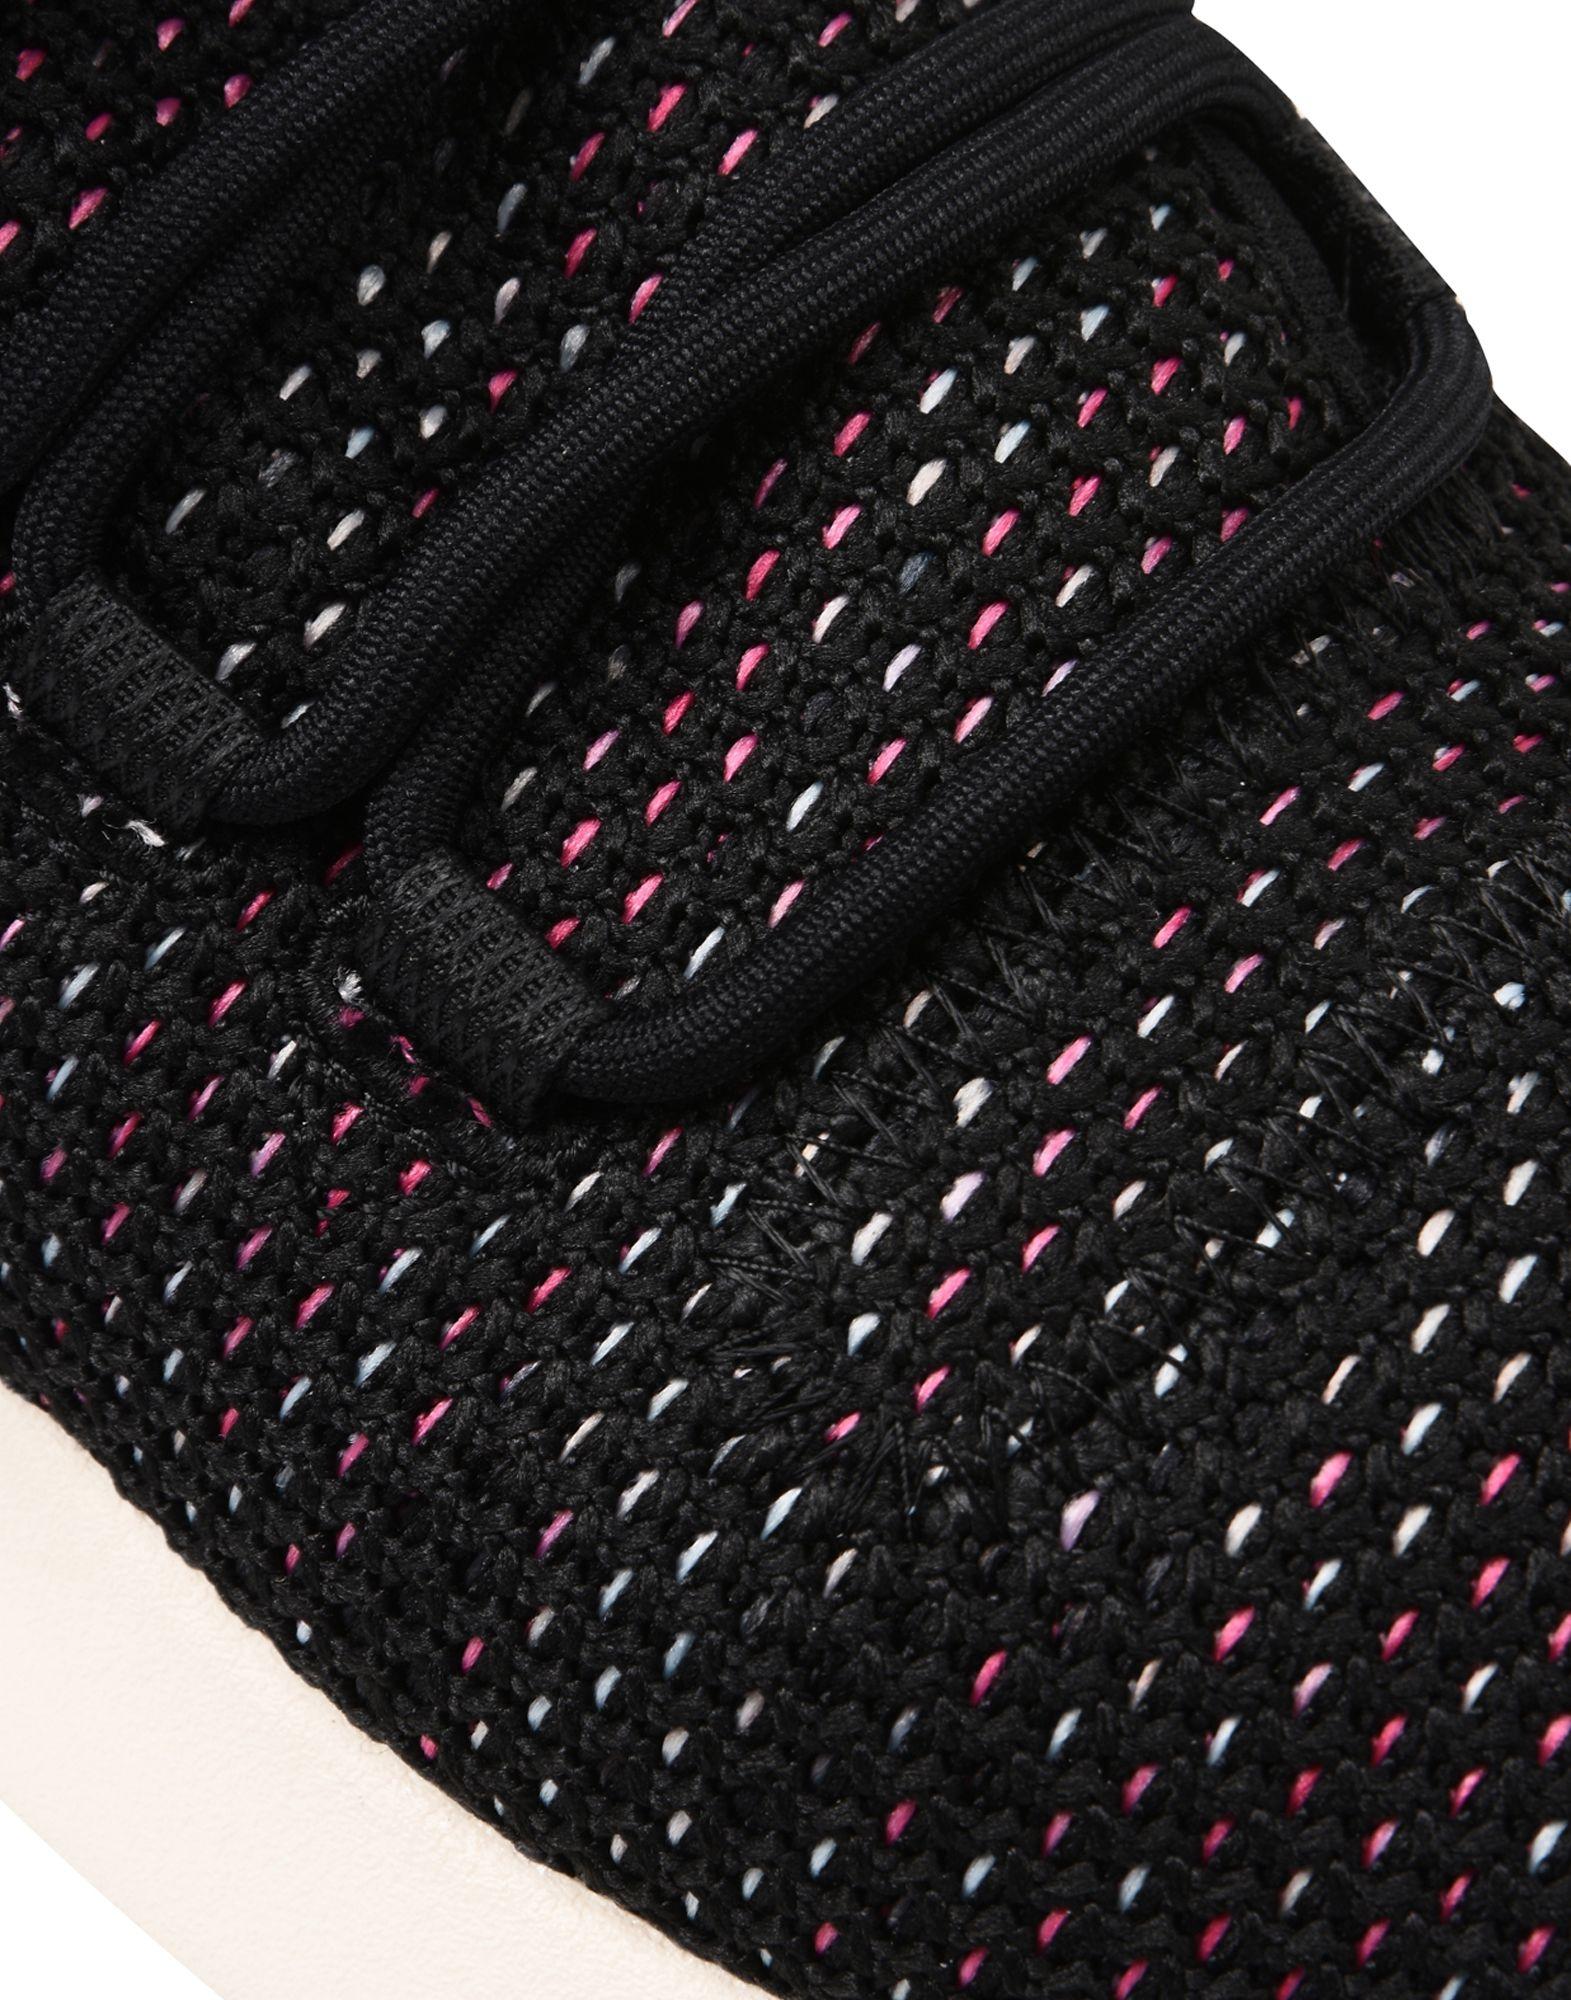 Adidas Originals Qualität Tubular Shadow Ck W  11533799QB Gute Qualität Originals beliebte Schuhe 20a016